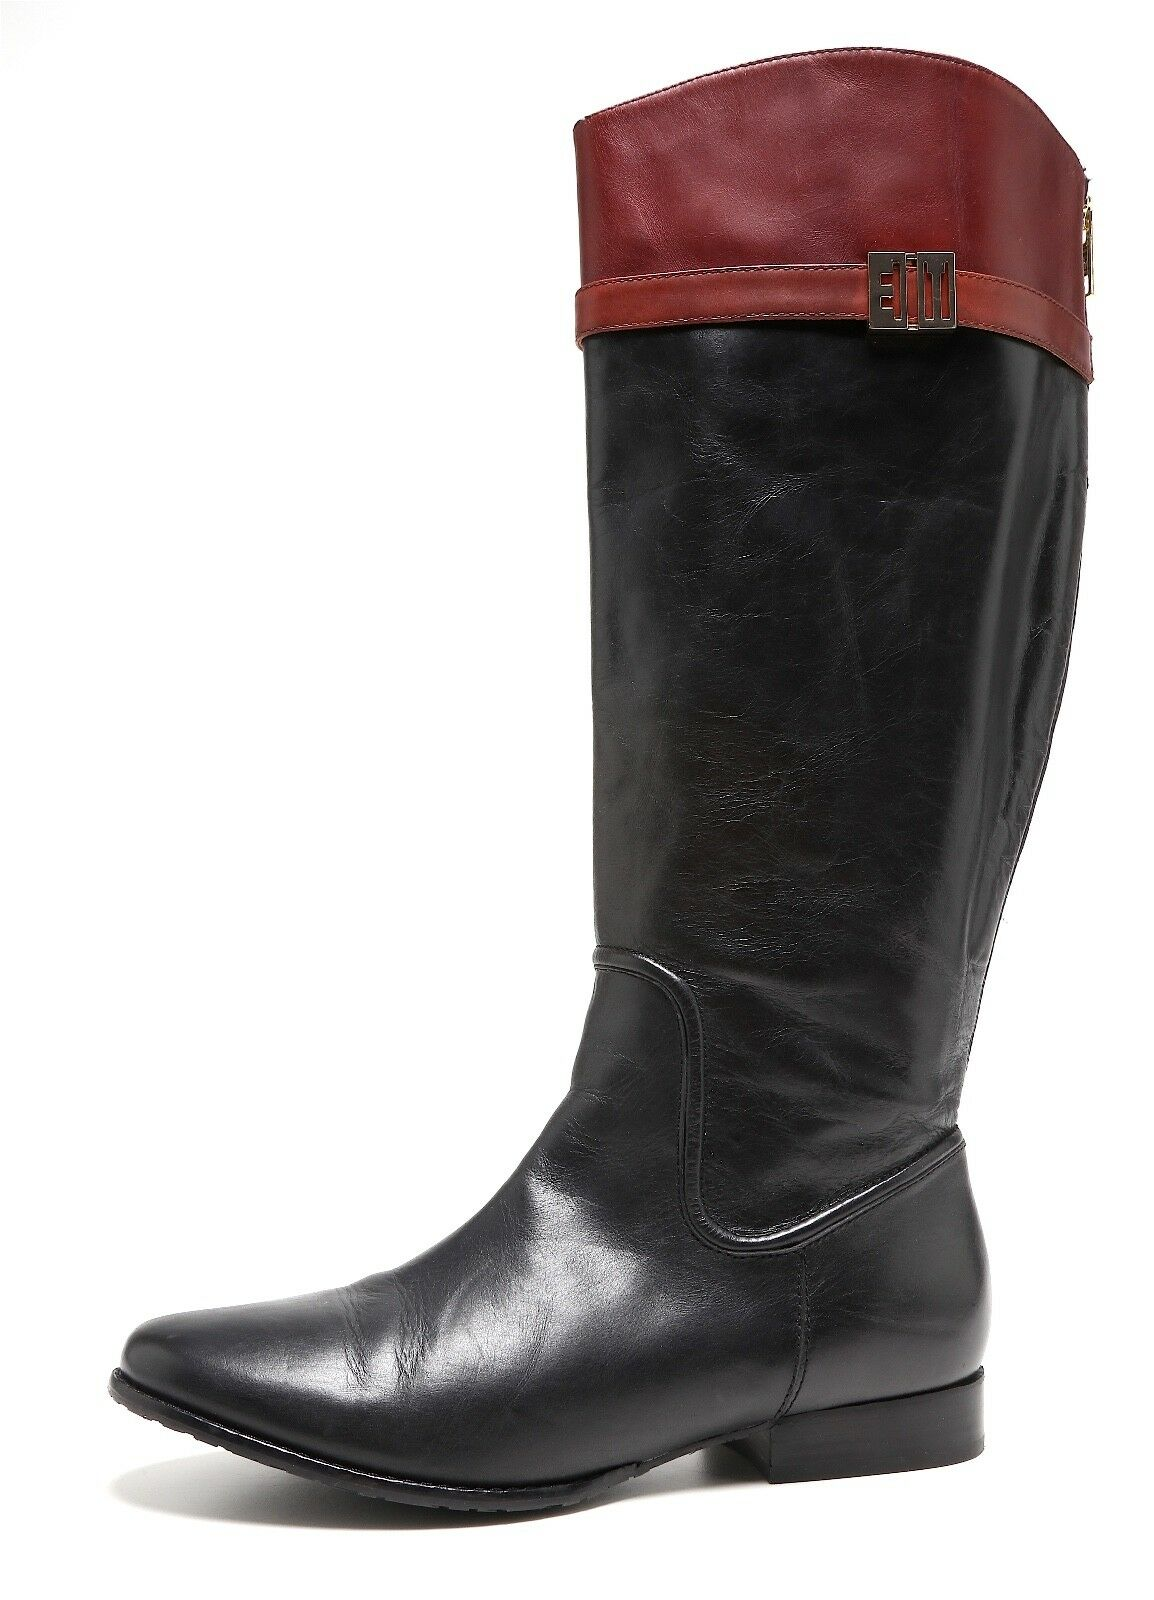 Elaine Turner Trey Leather Riding Boots Black Women Sz 9 7918